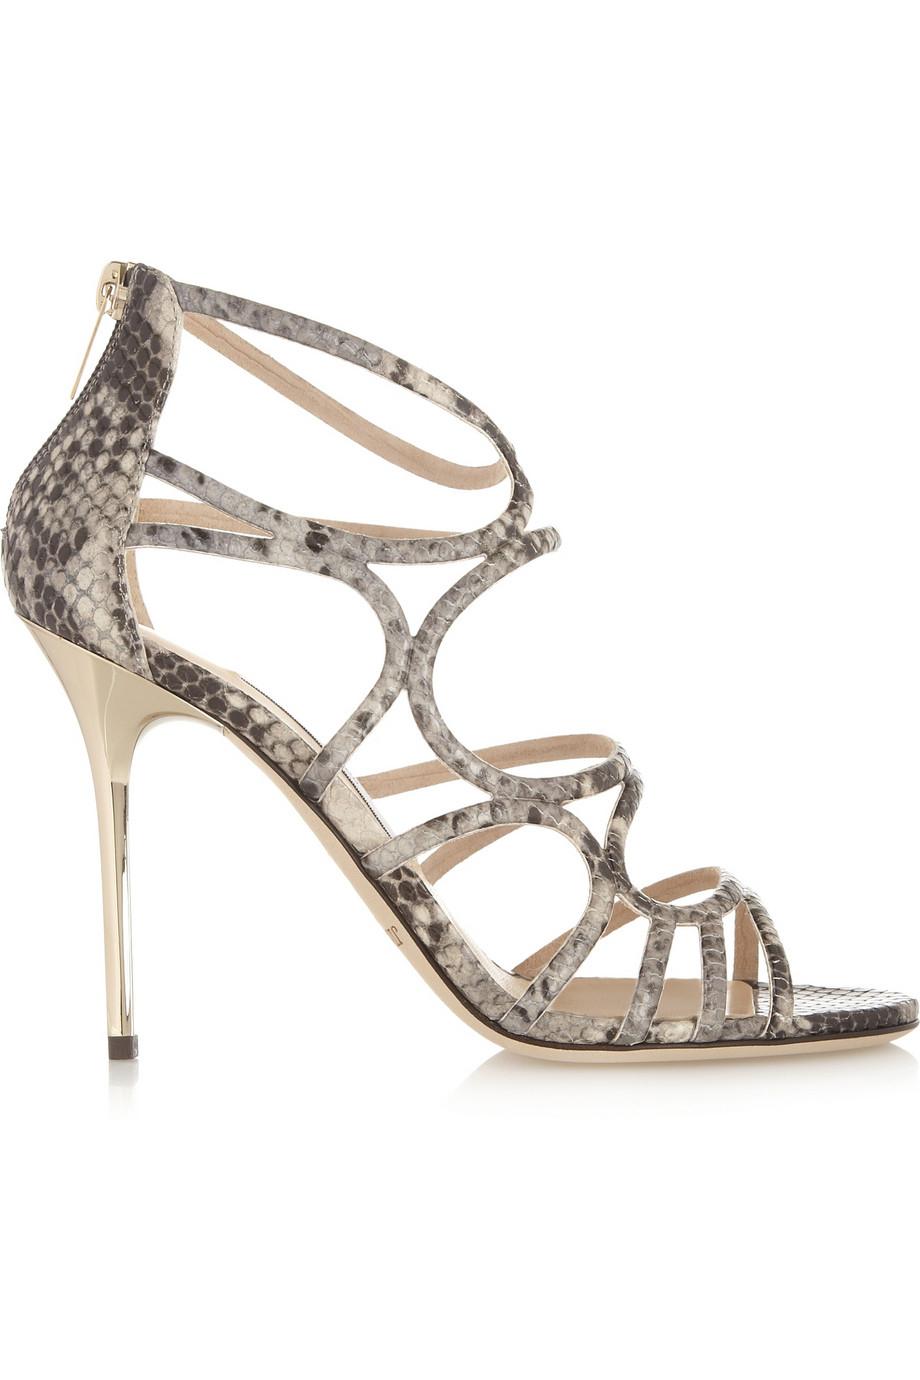 a2ce561c9038f2 Jimmy Choo Sazerac Snake-Effect Leather Sandals - Lyst